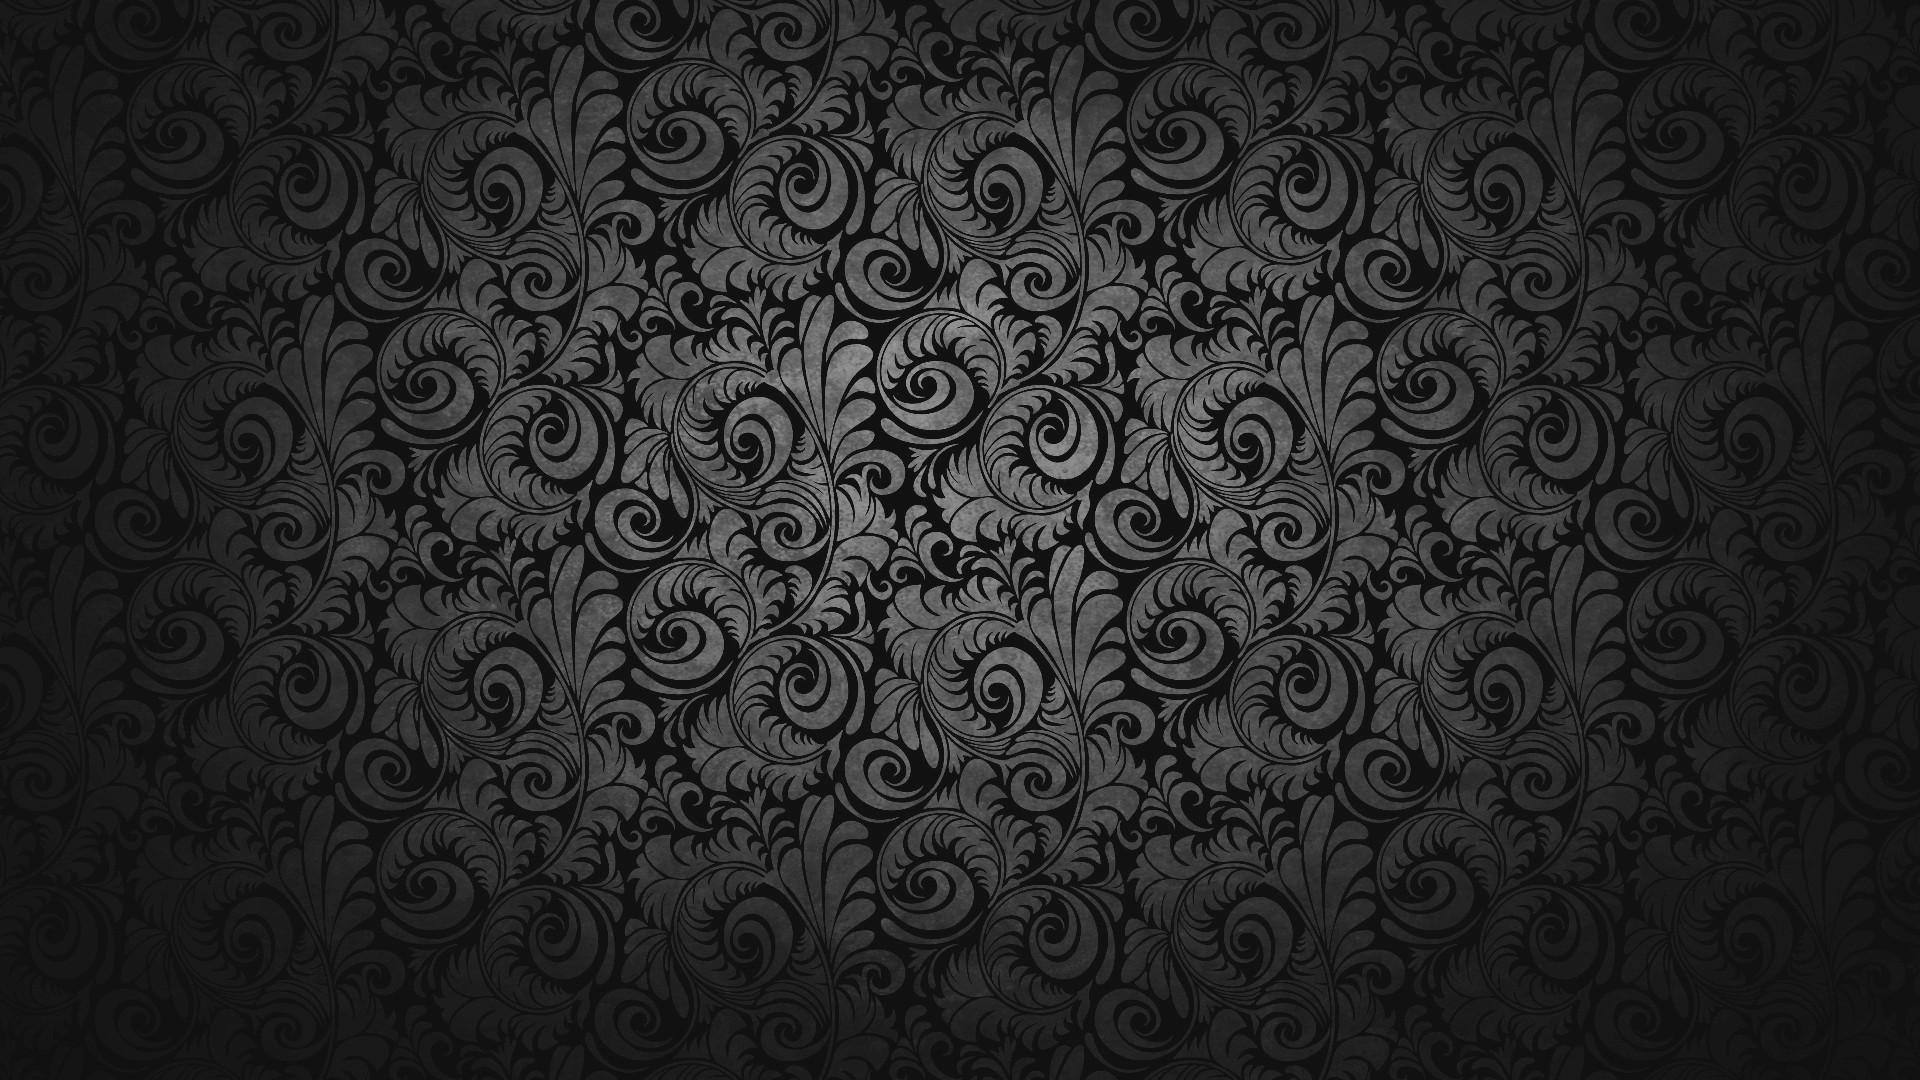 Architecture Floral Black Dark 556183 Wallpaper wallpaper download